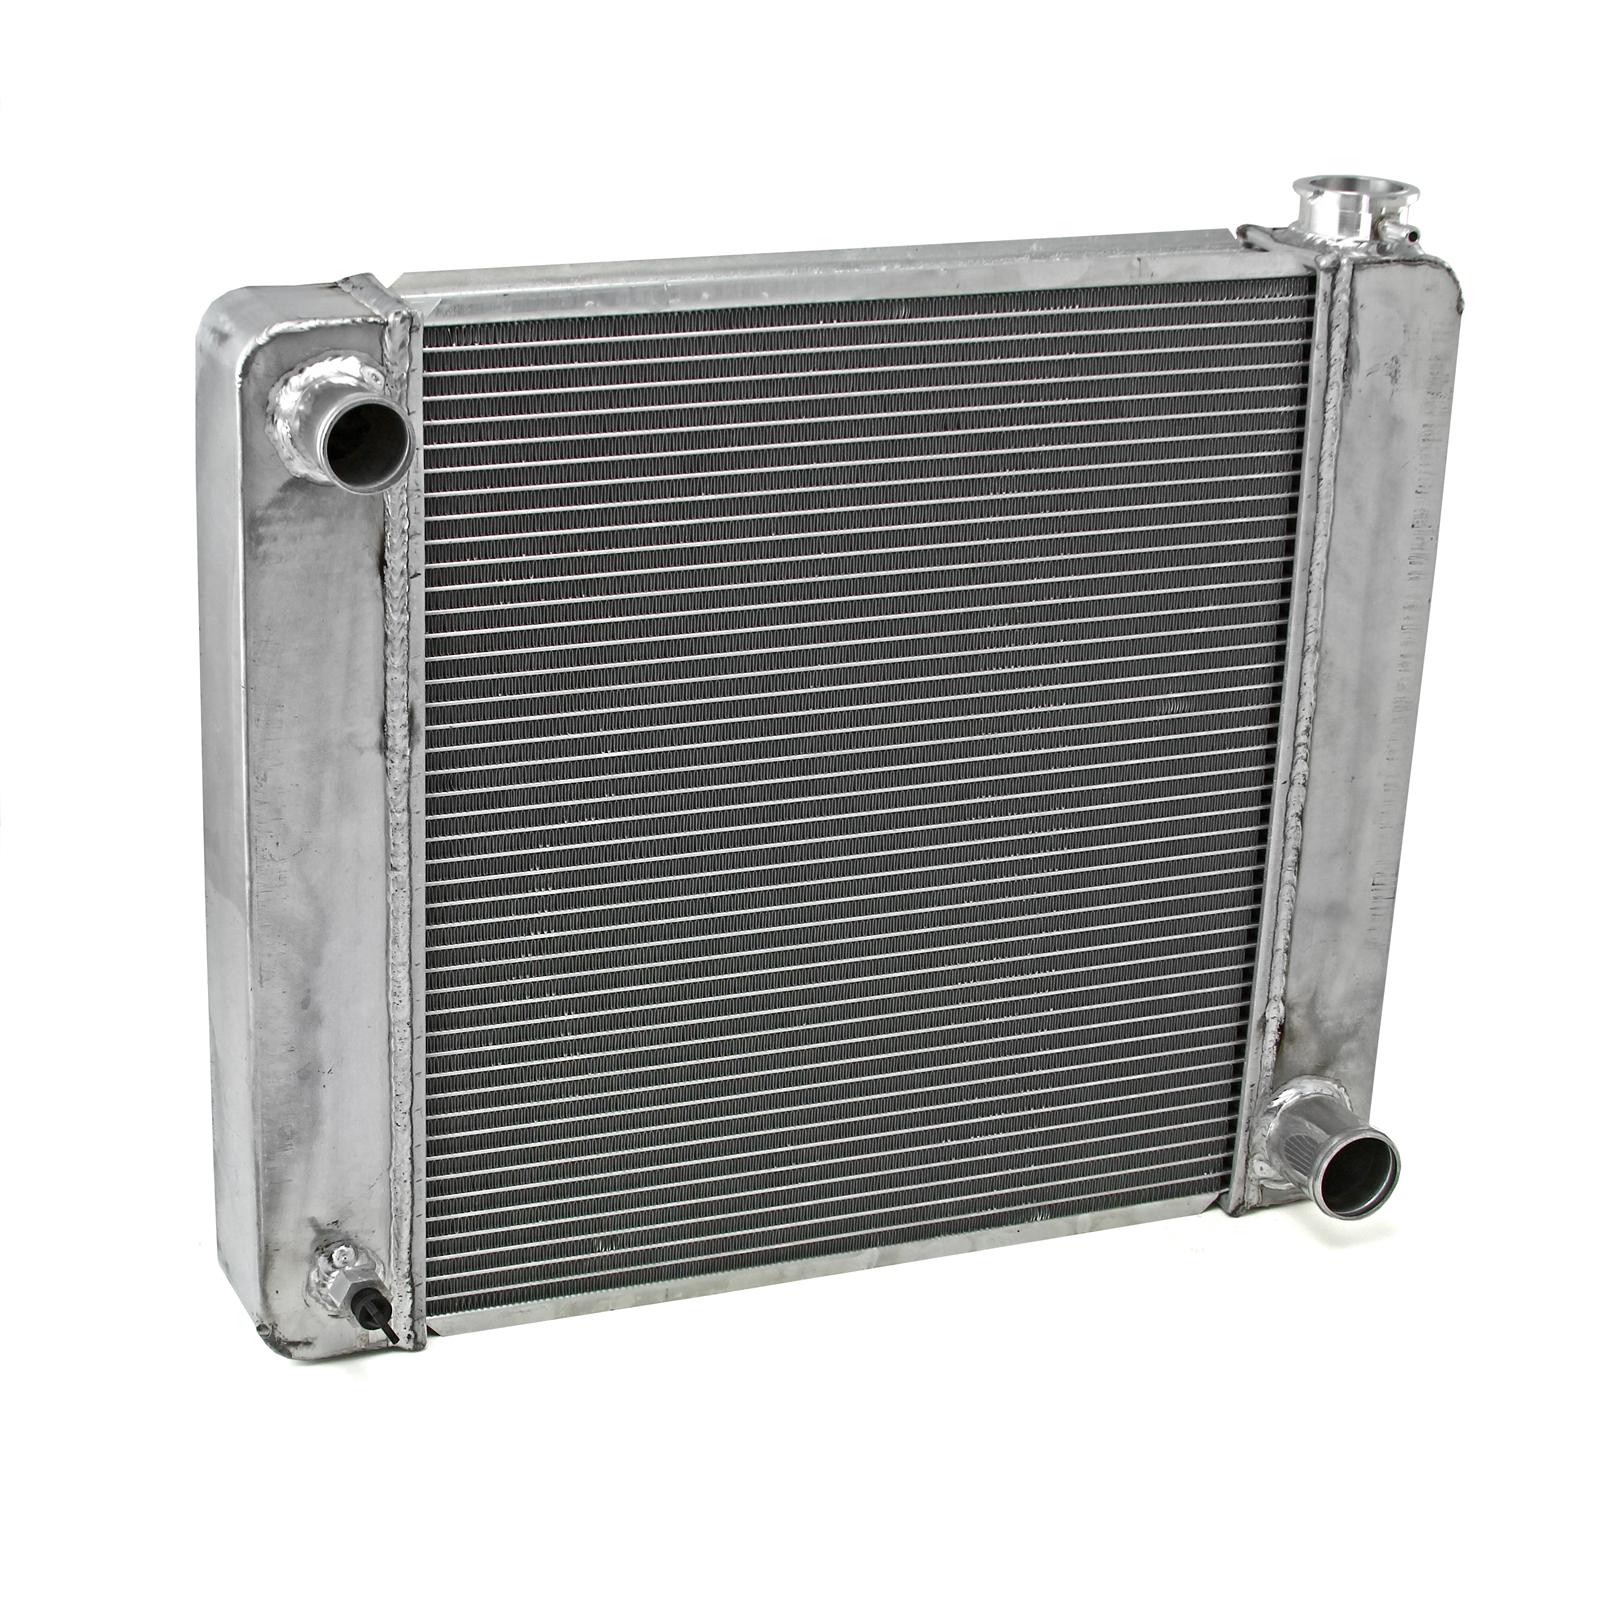 Gm Chevy 26x19x2.2 Aluminum Radiator (TL-BR O/Let) Satin (W D/Plug)